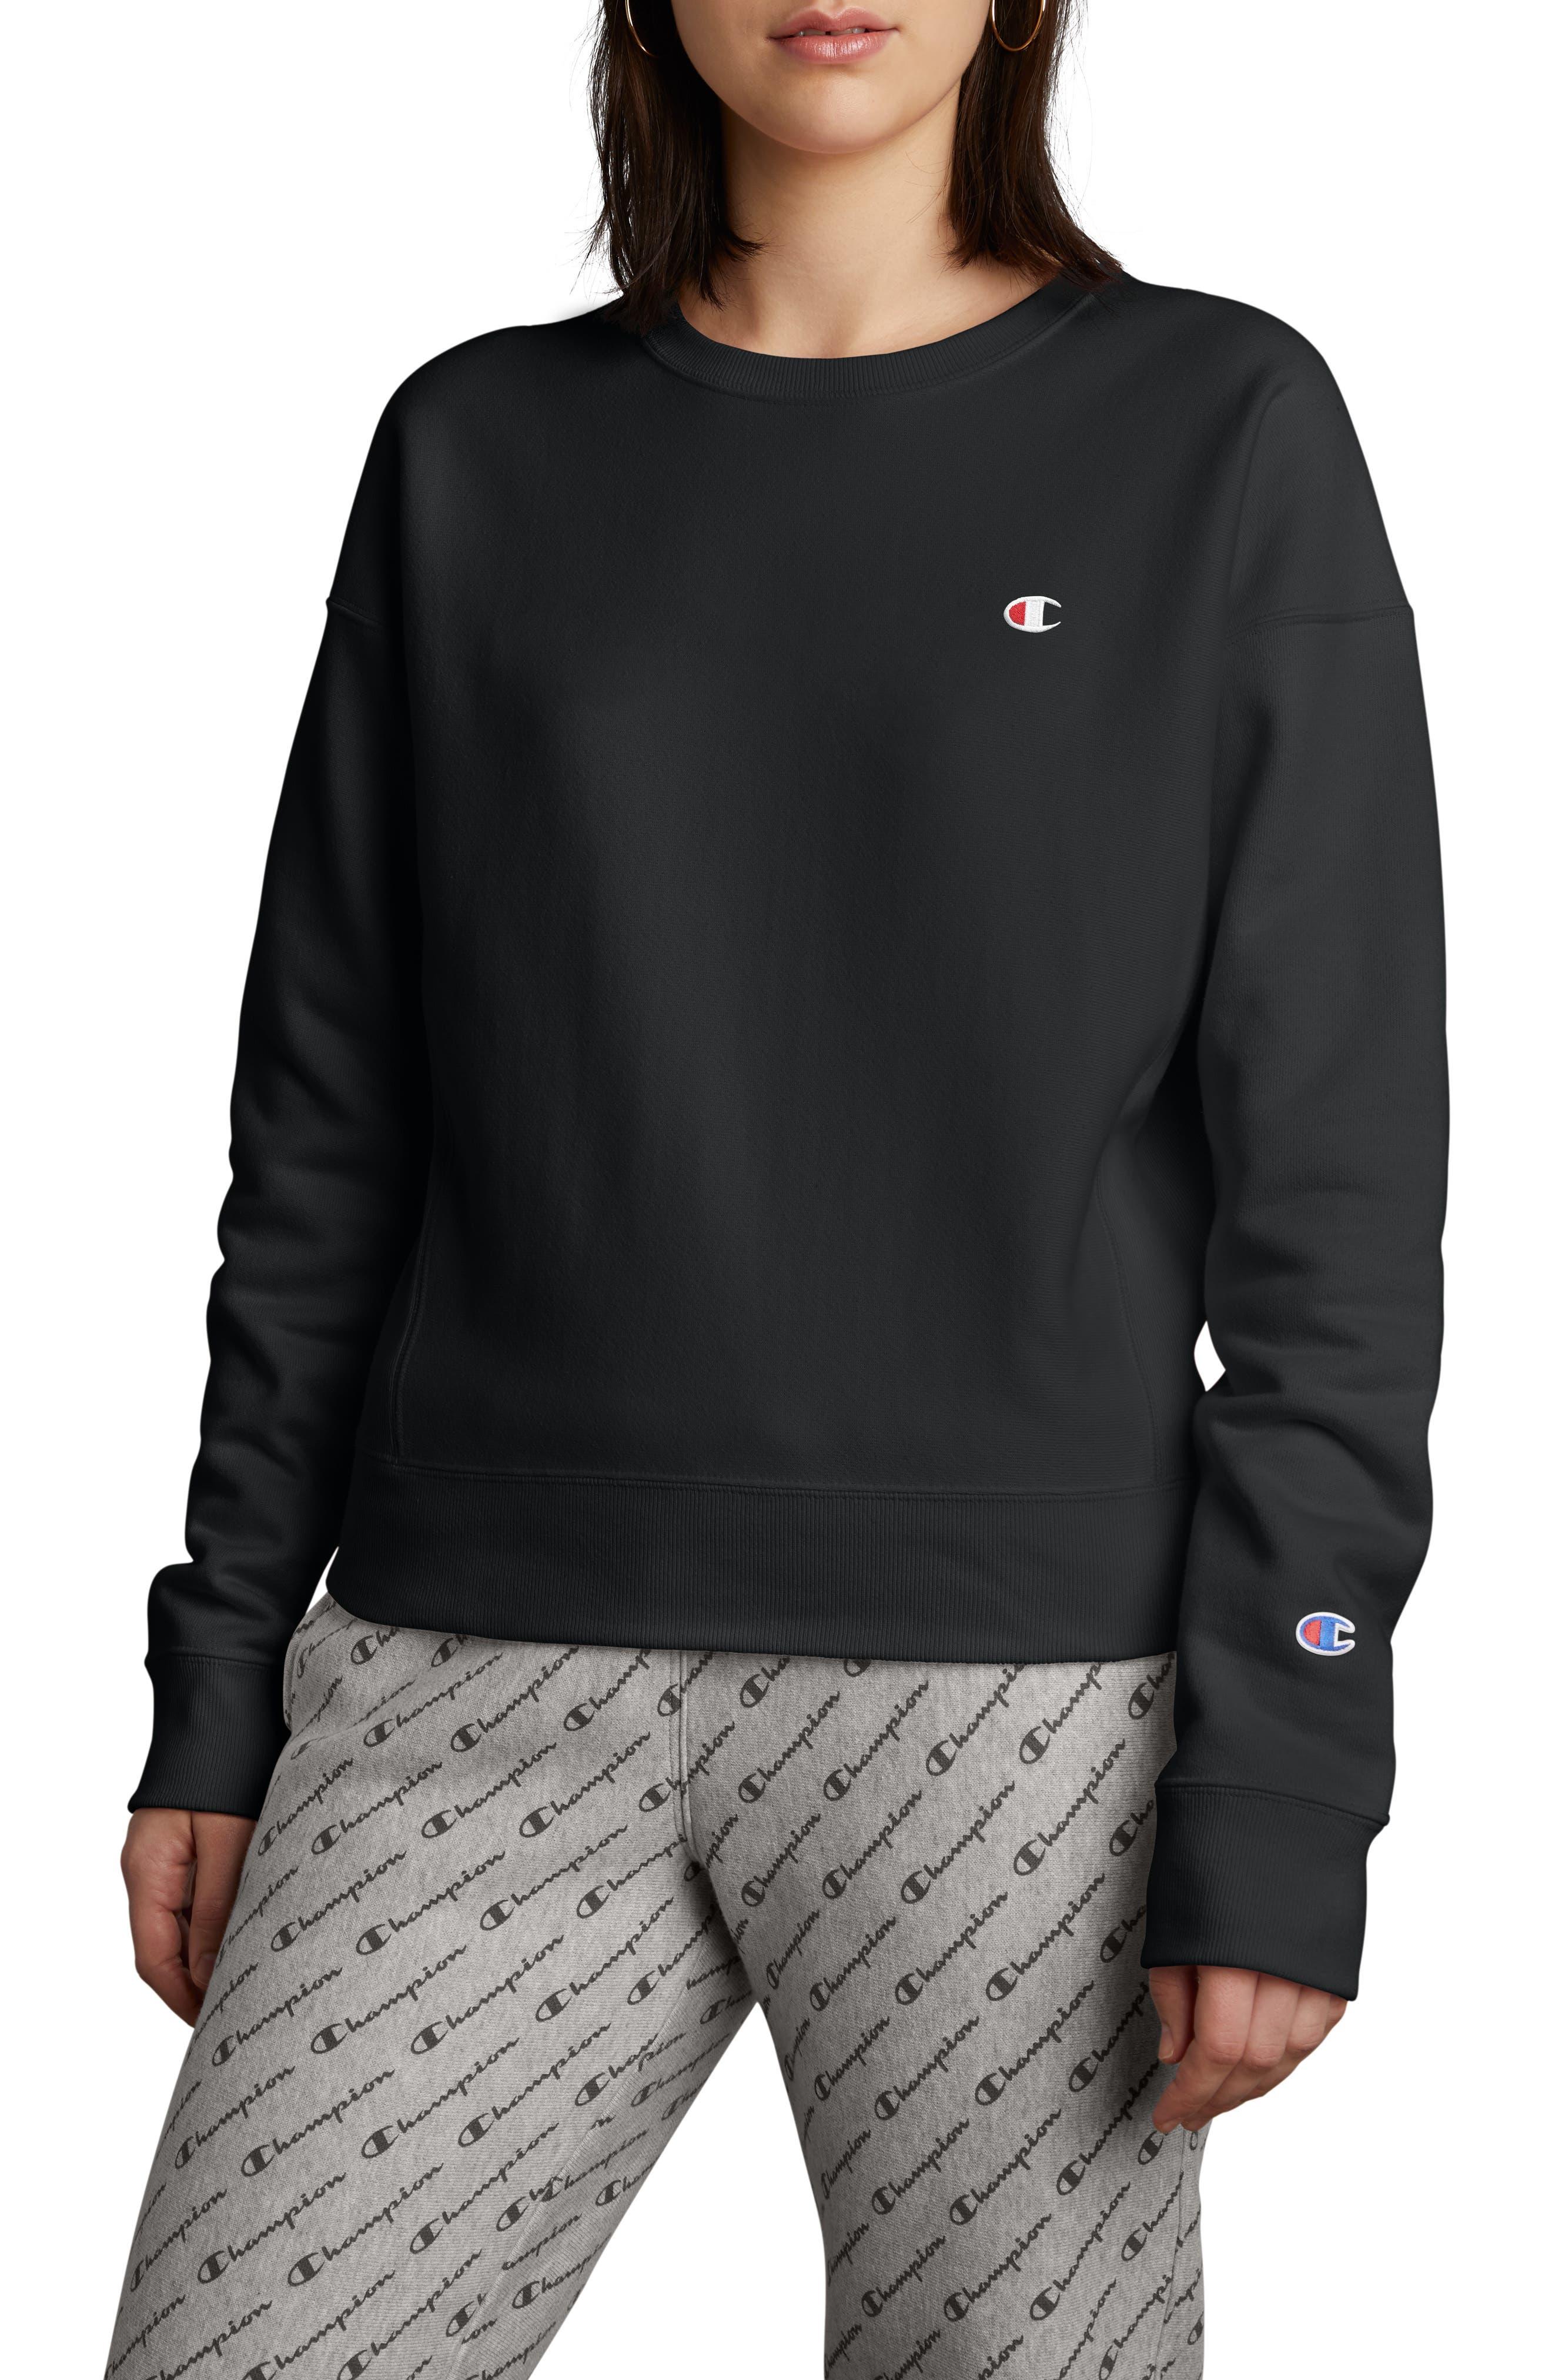 20e836d3c08b Women s Champion Sweatshirts   Hoodies